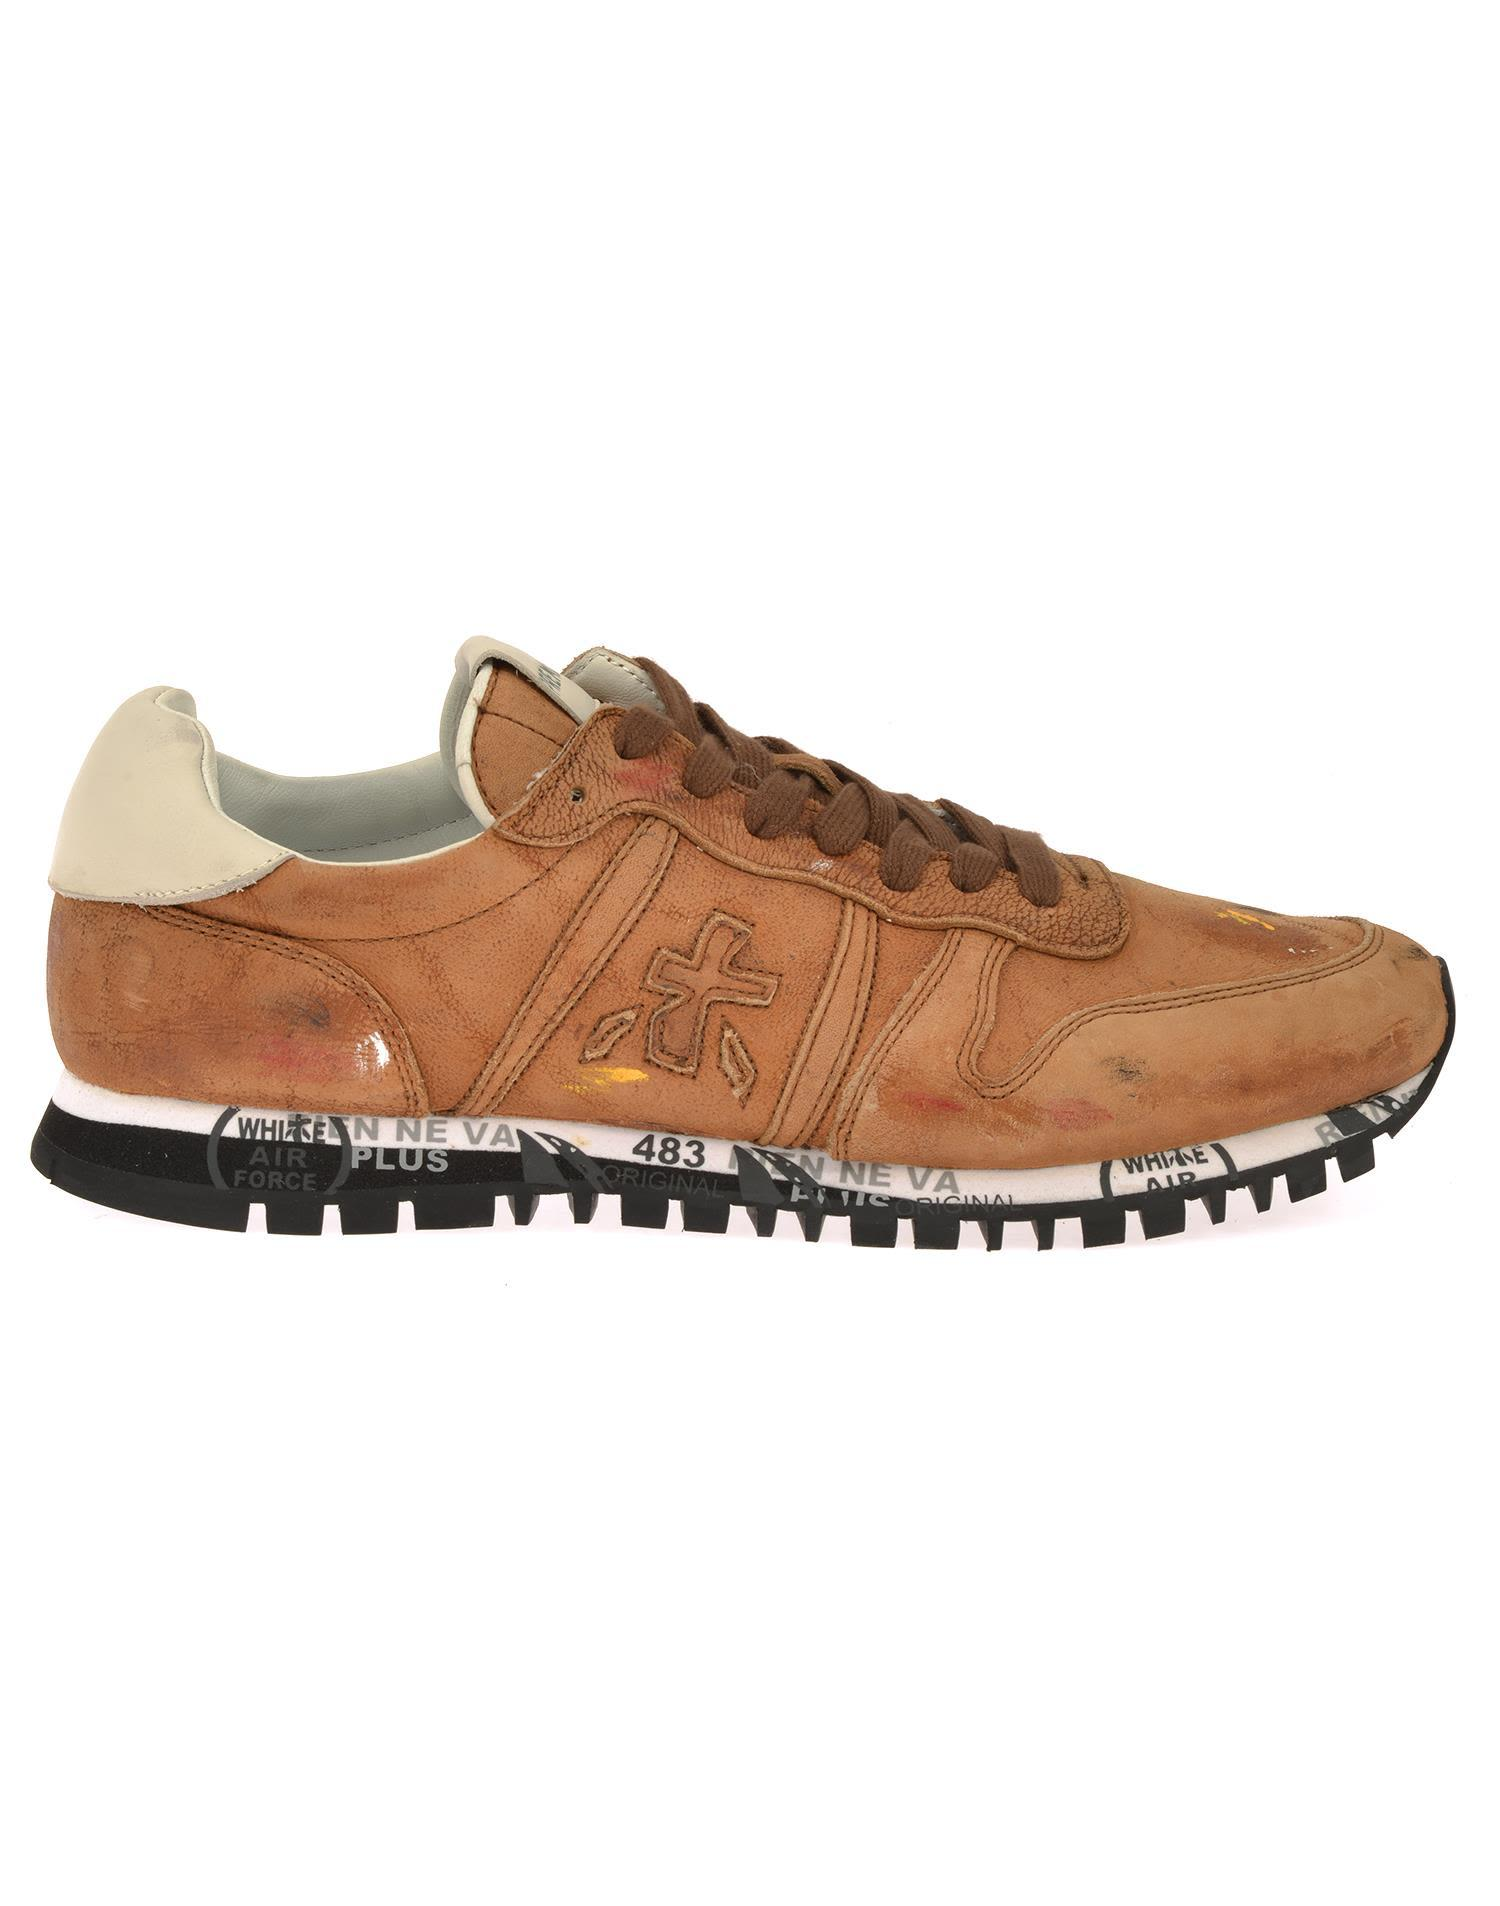 White Premiata Prince Sneaker In Brown